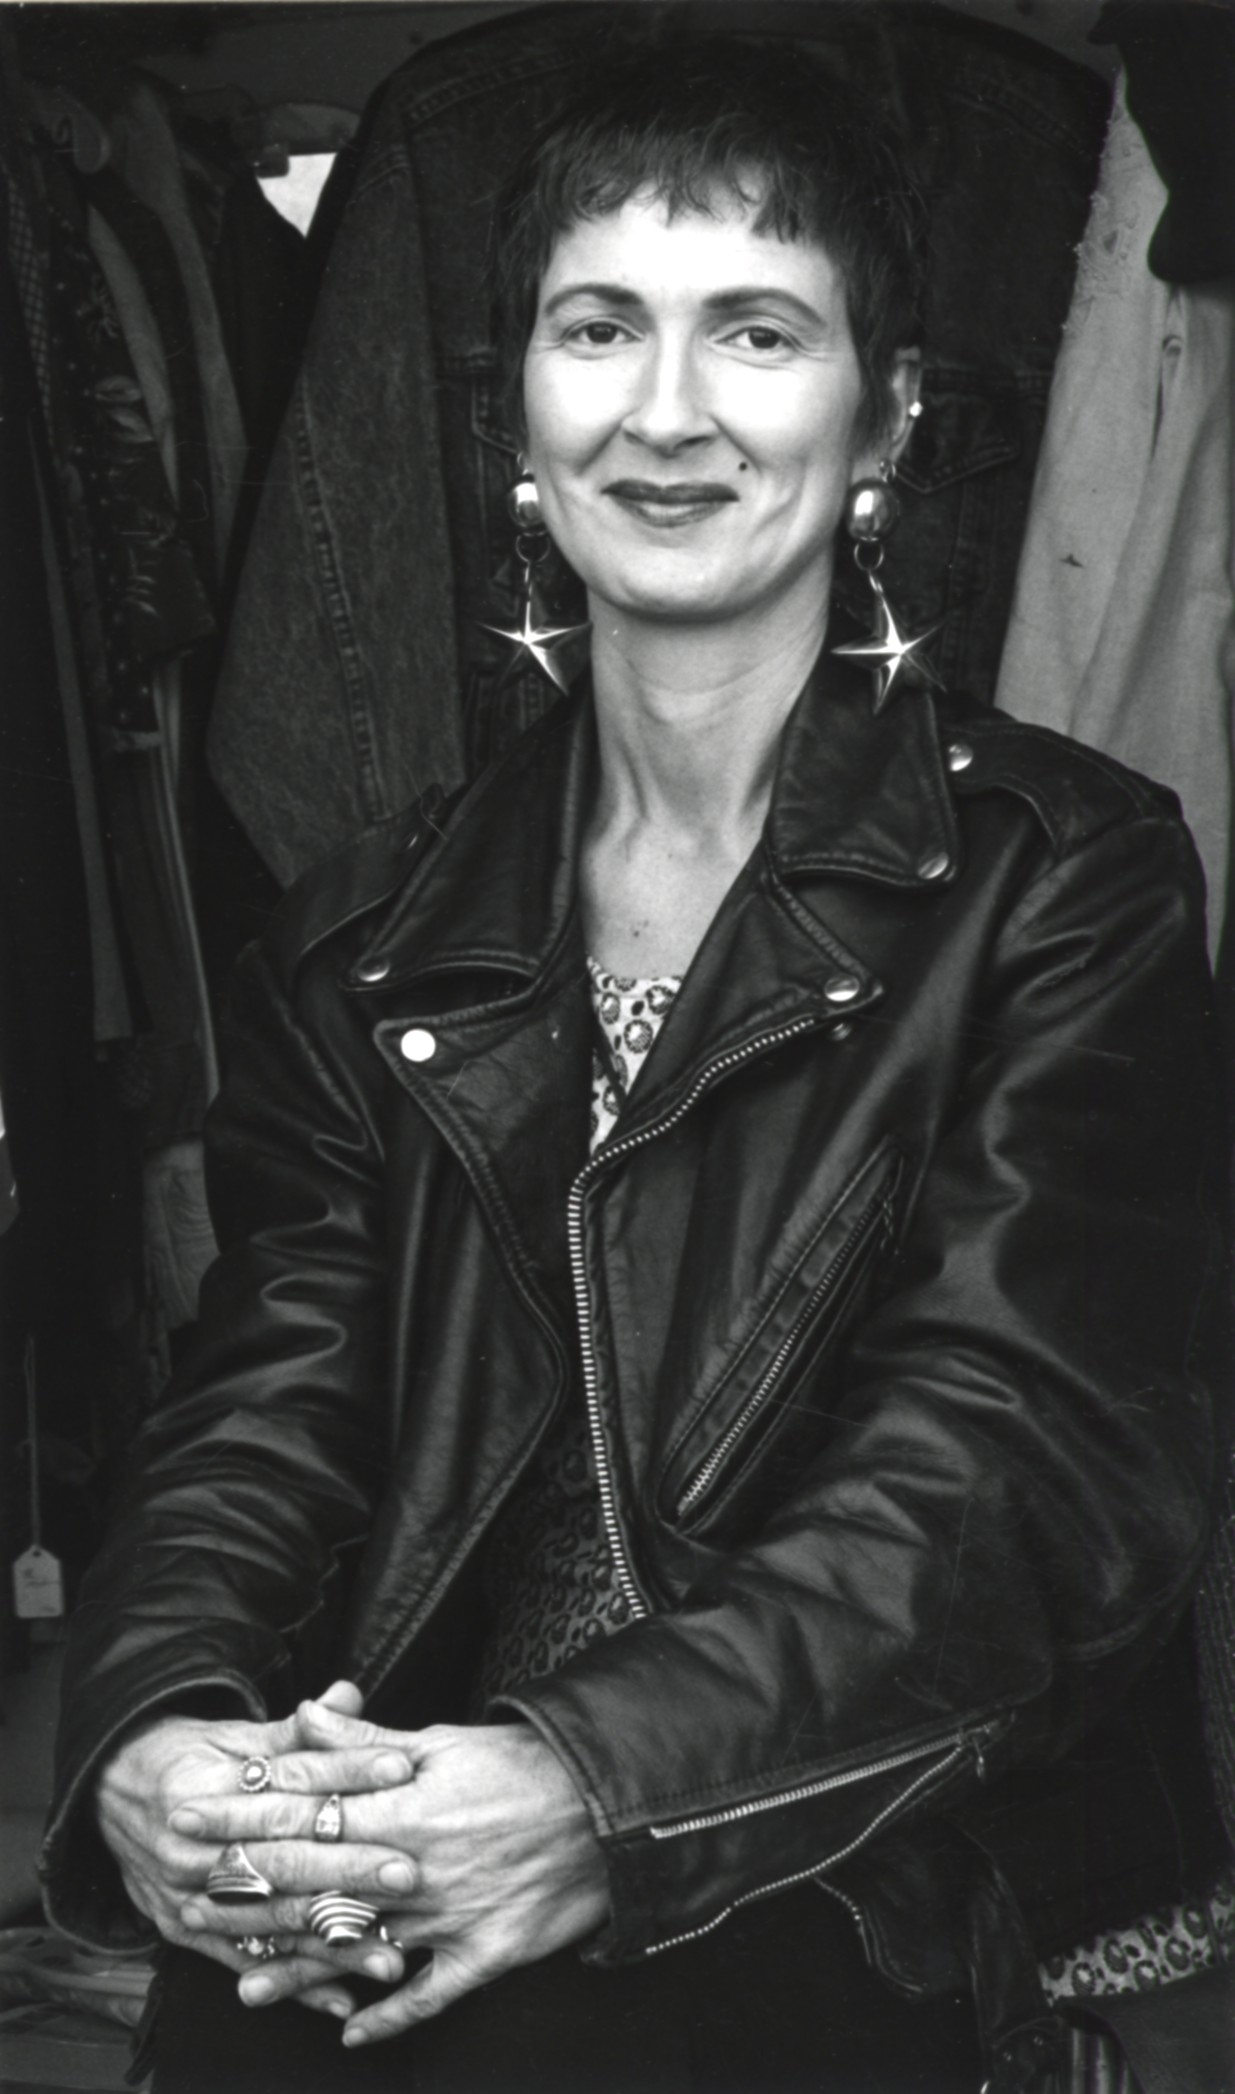 Mara - Pasadena CA 1994